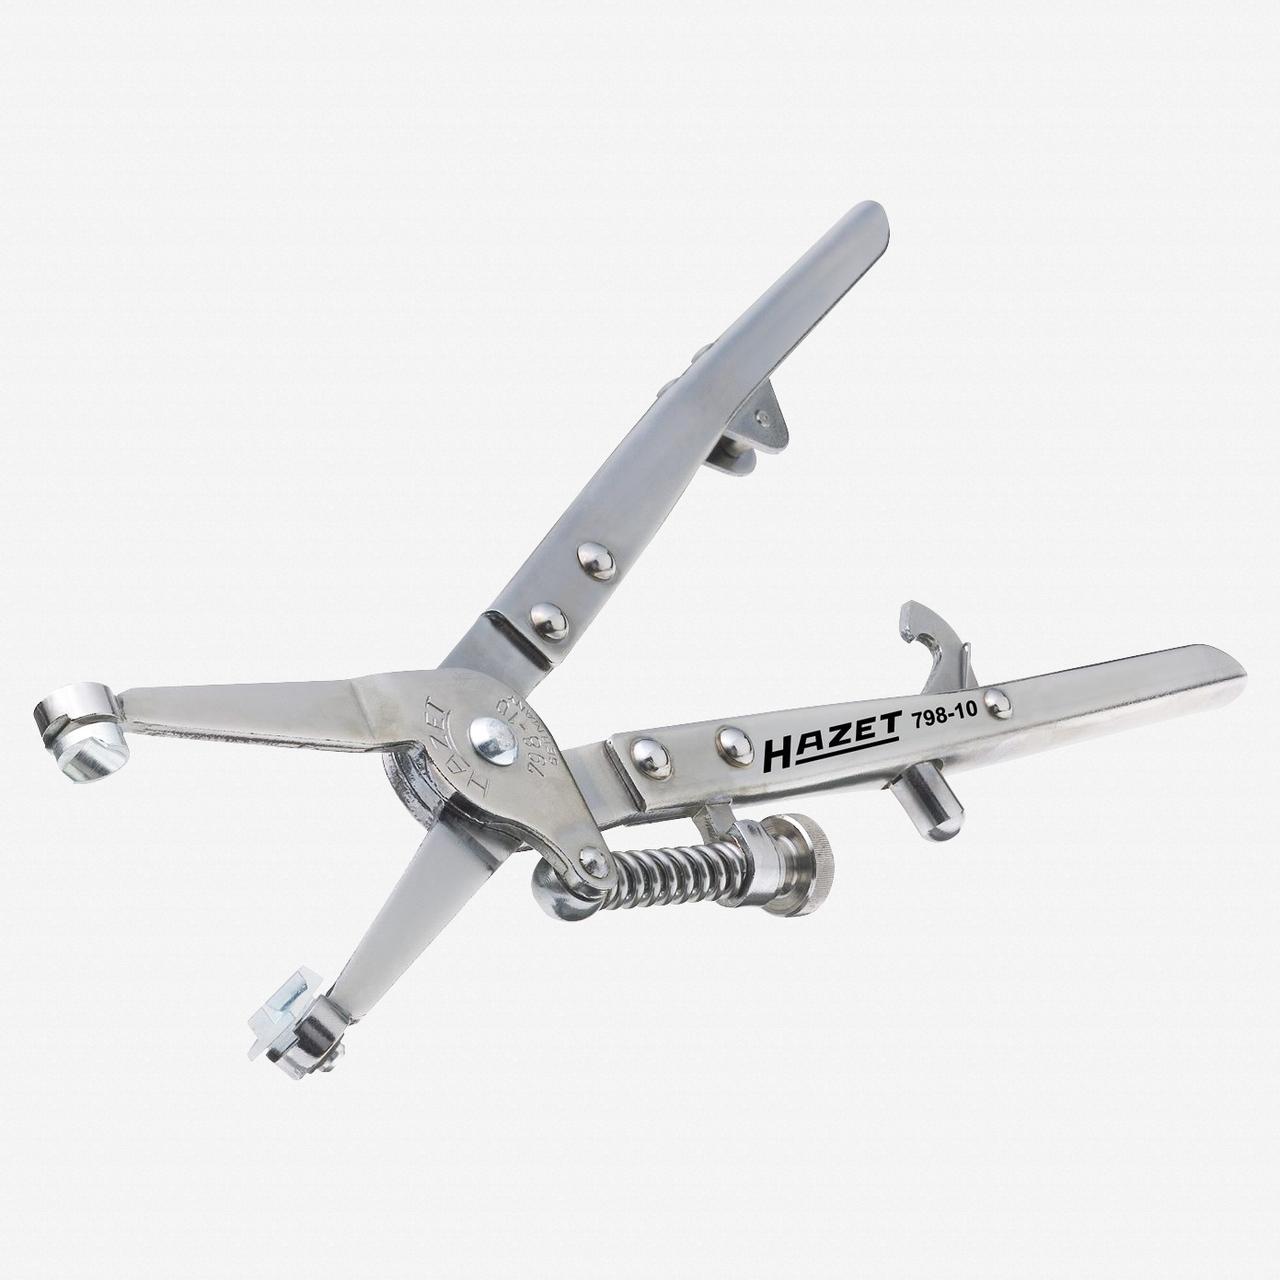 Hazet 798-10 Hose clamp pliers   - KC Tool